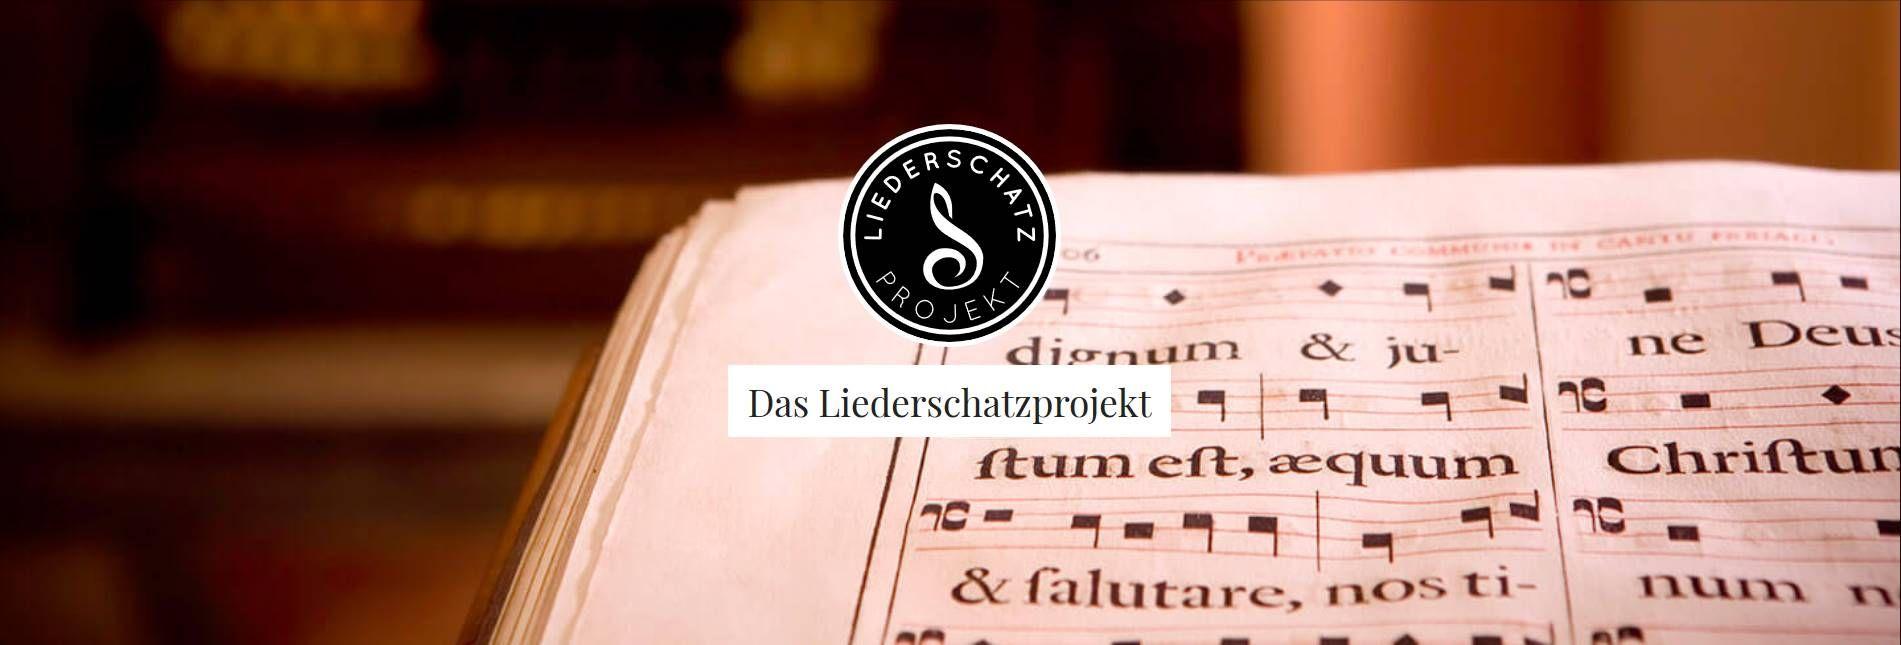 Das Liederschatz-Projekt